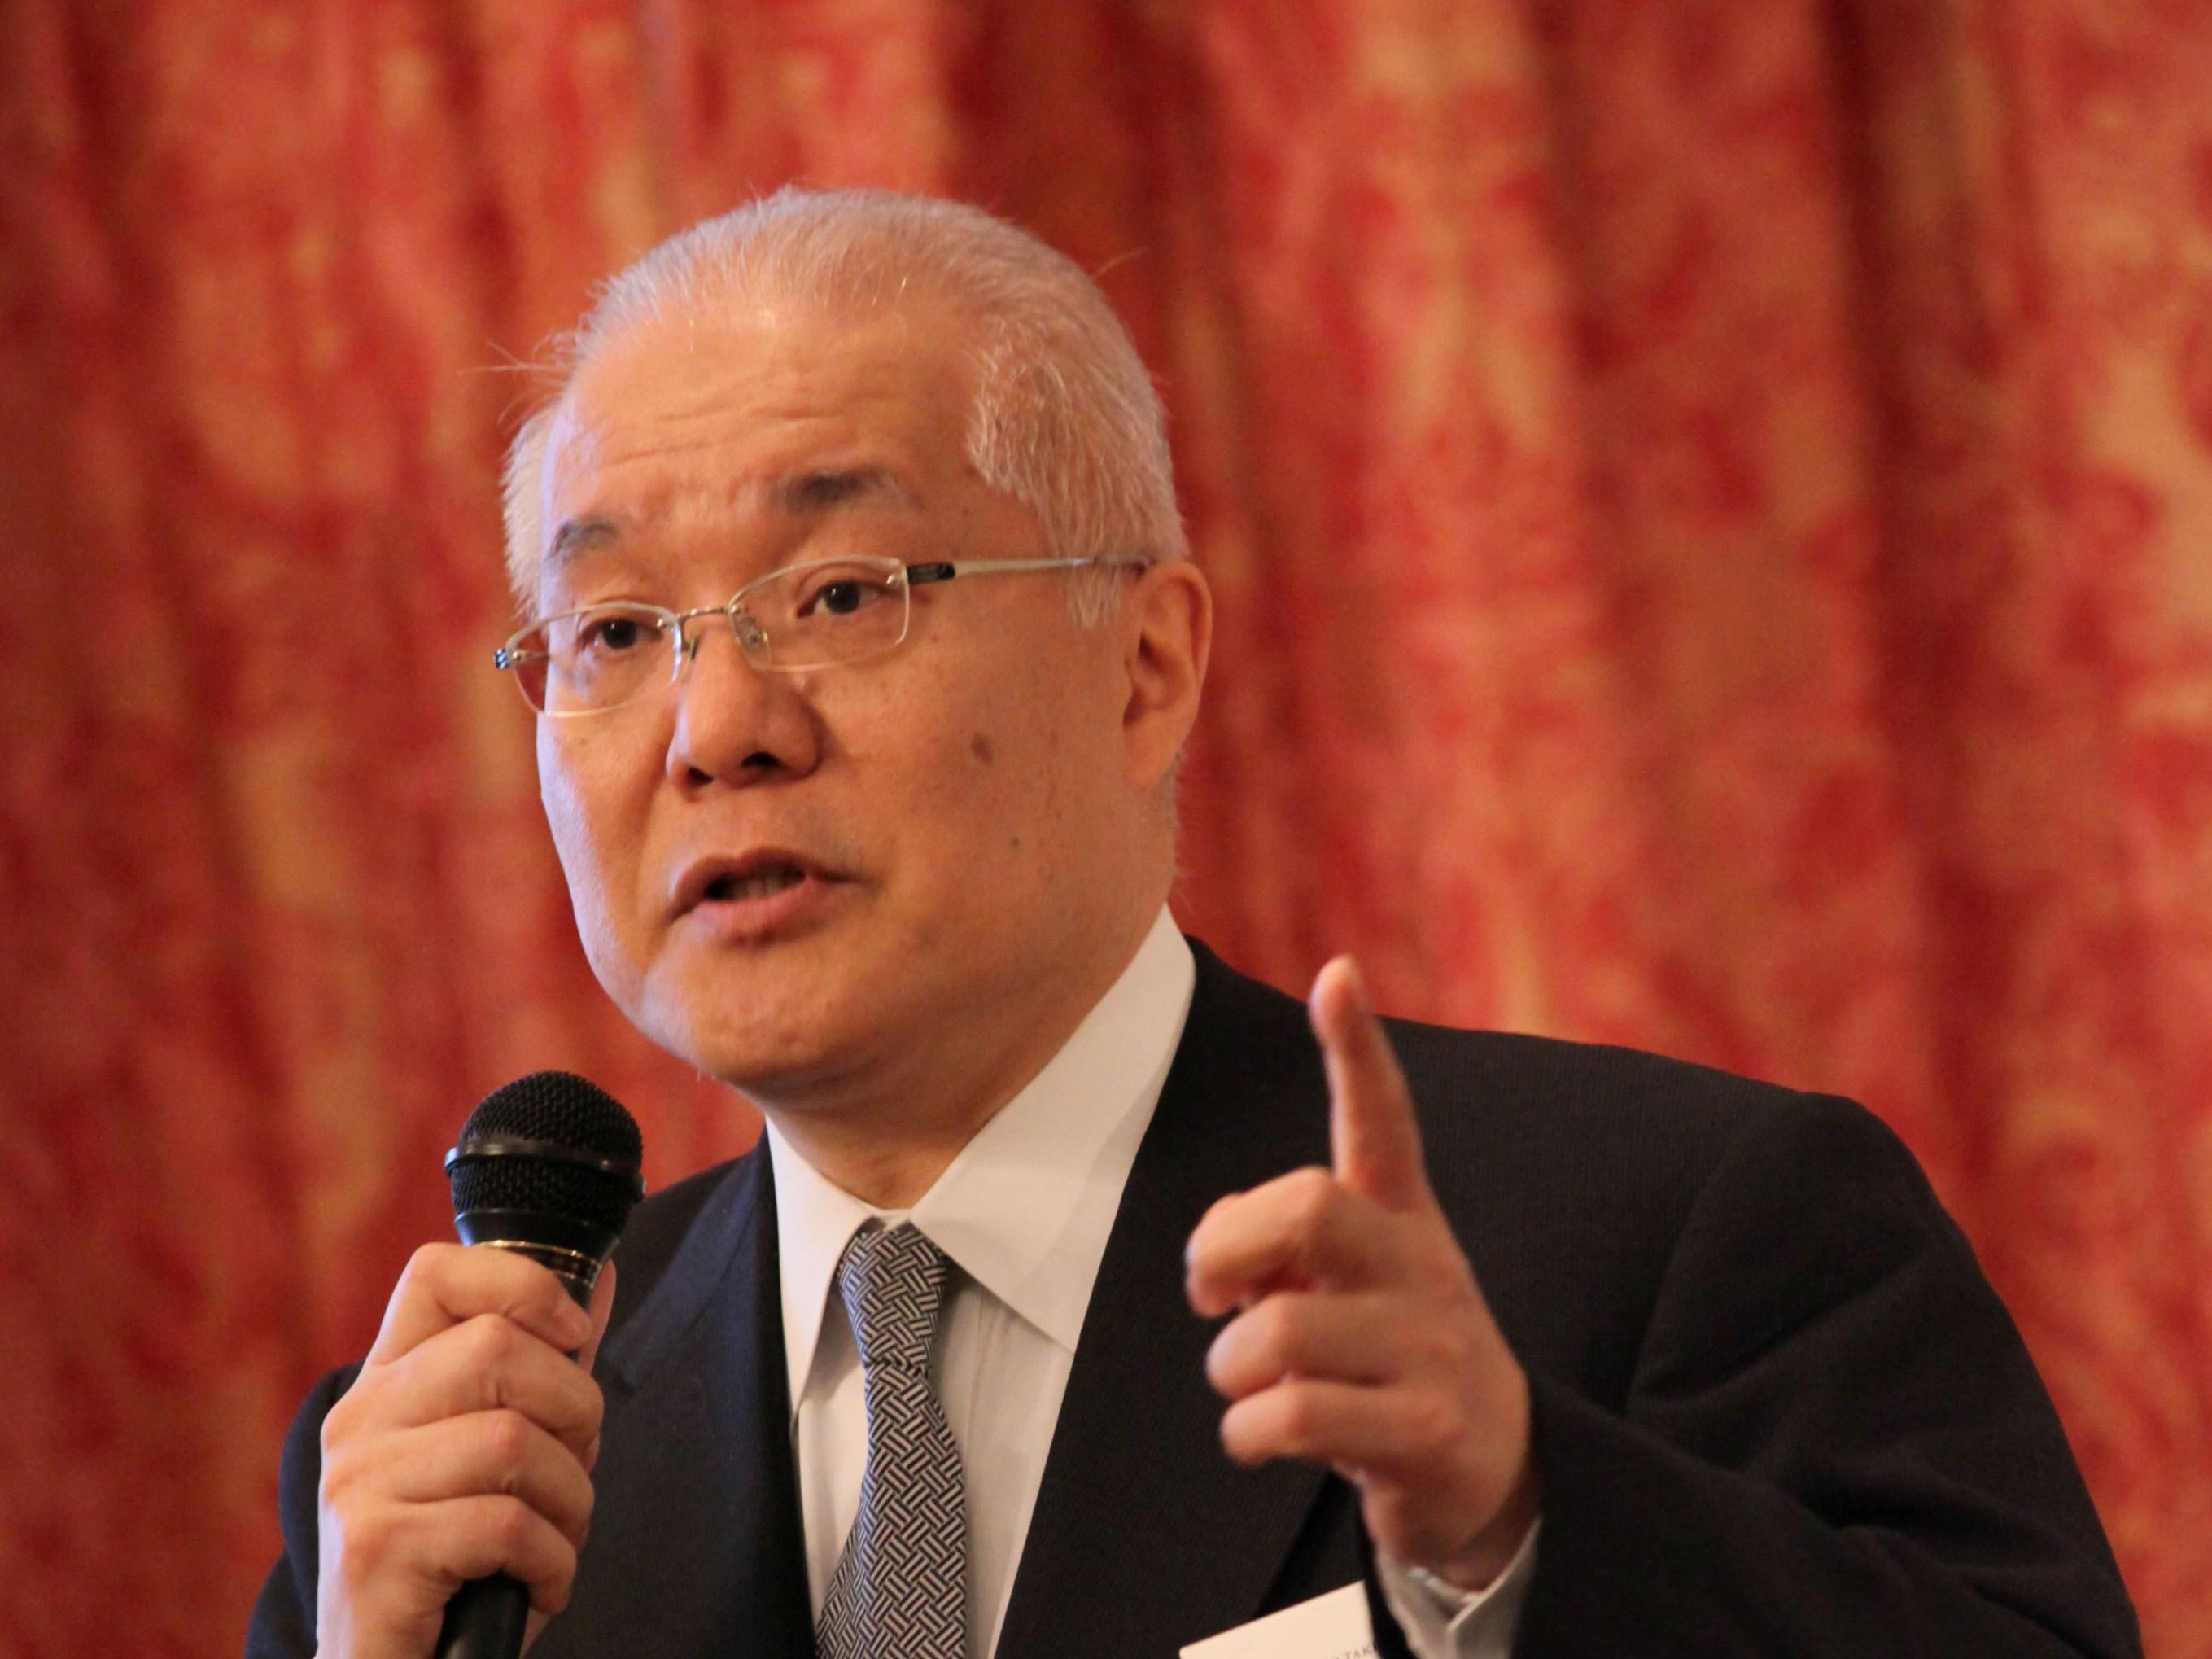 Dr. Keizo Takemi, Professor, Tokai University School of Political Science and Economics / Senior Fellow, Japan Center for International Exchange (JCIE)